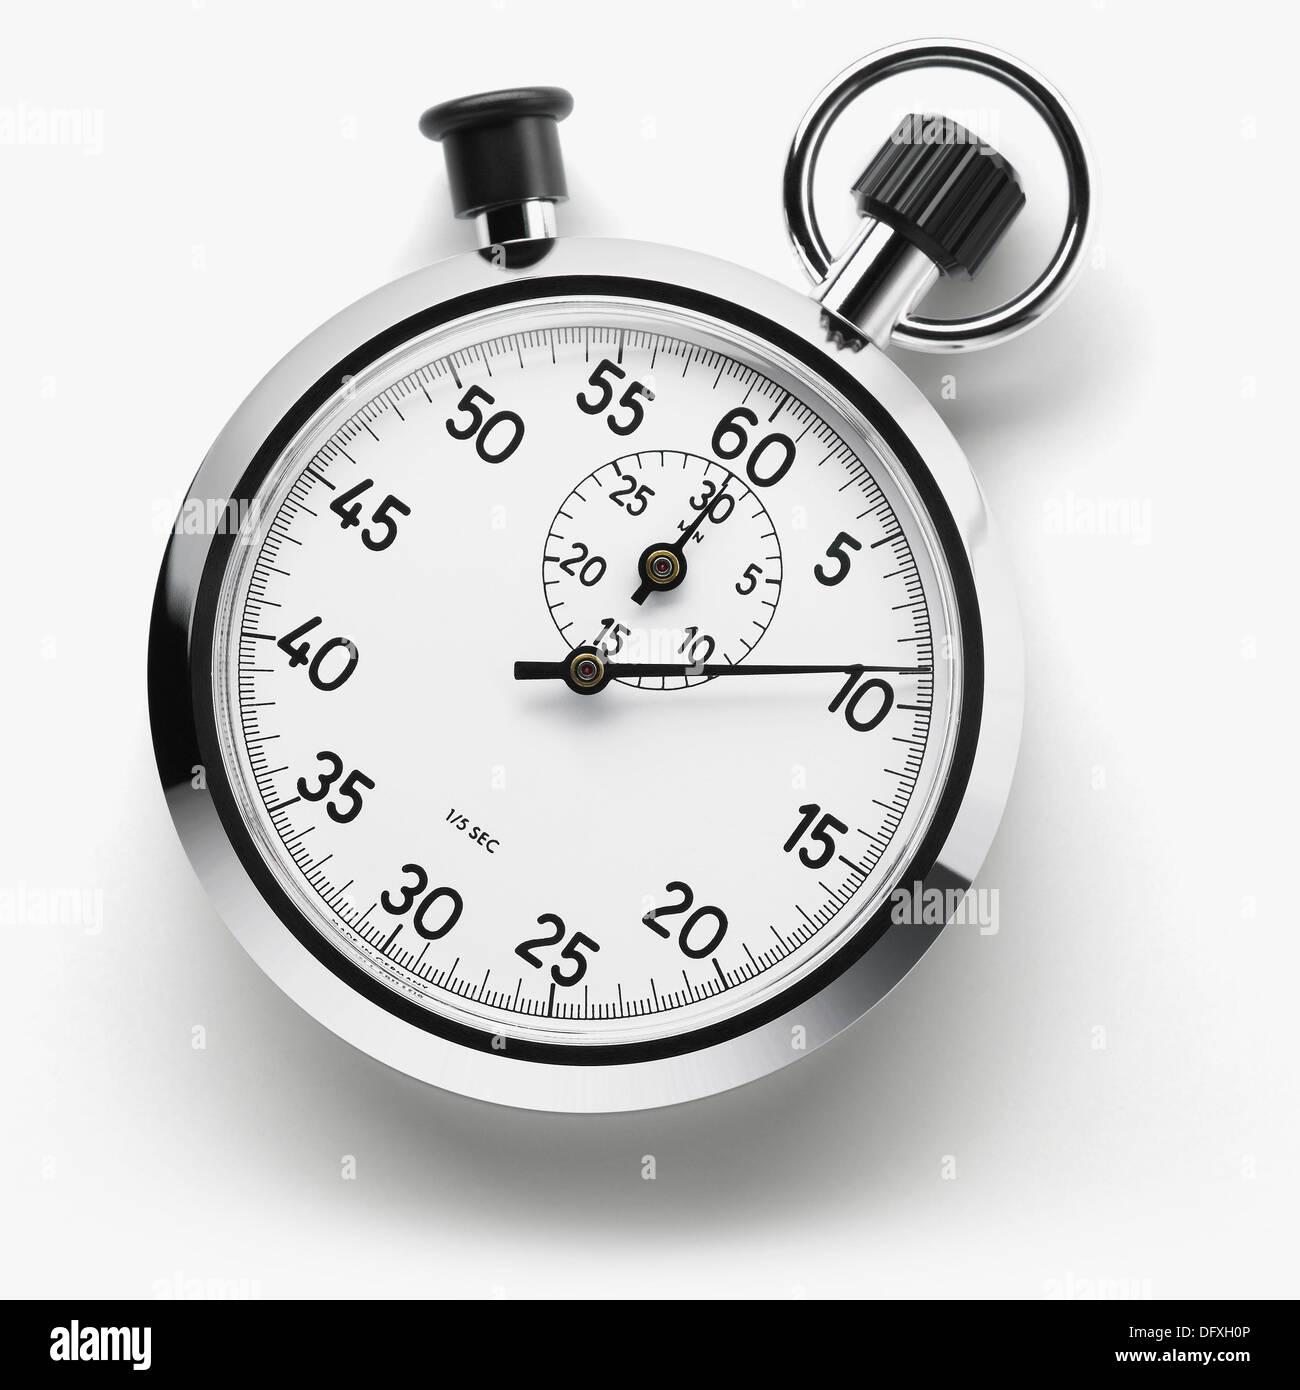 Chronometer - Stock Image